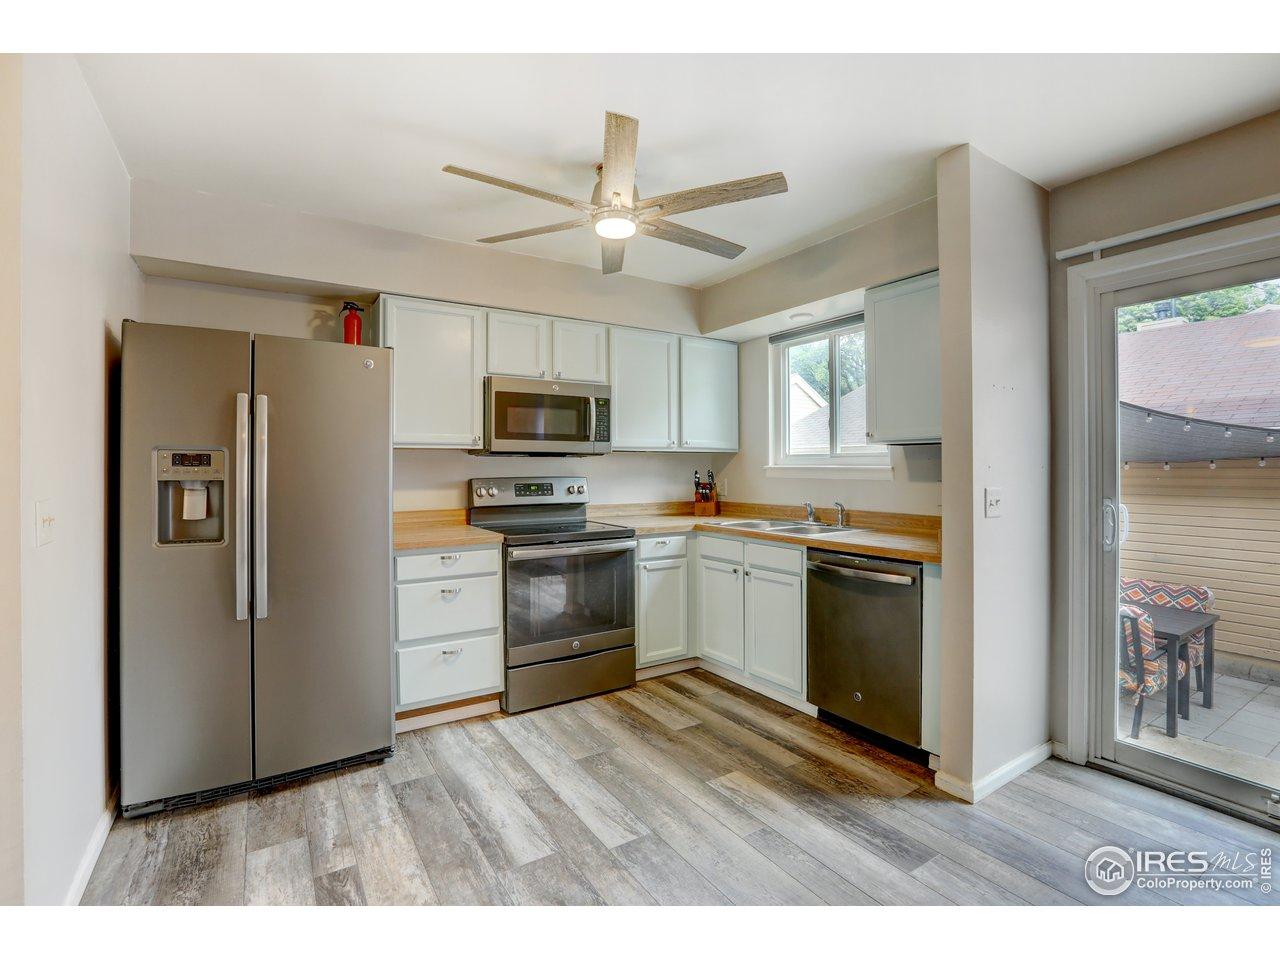 Stain less steel appliances, laminate flooring, upgraded lighting